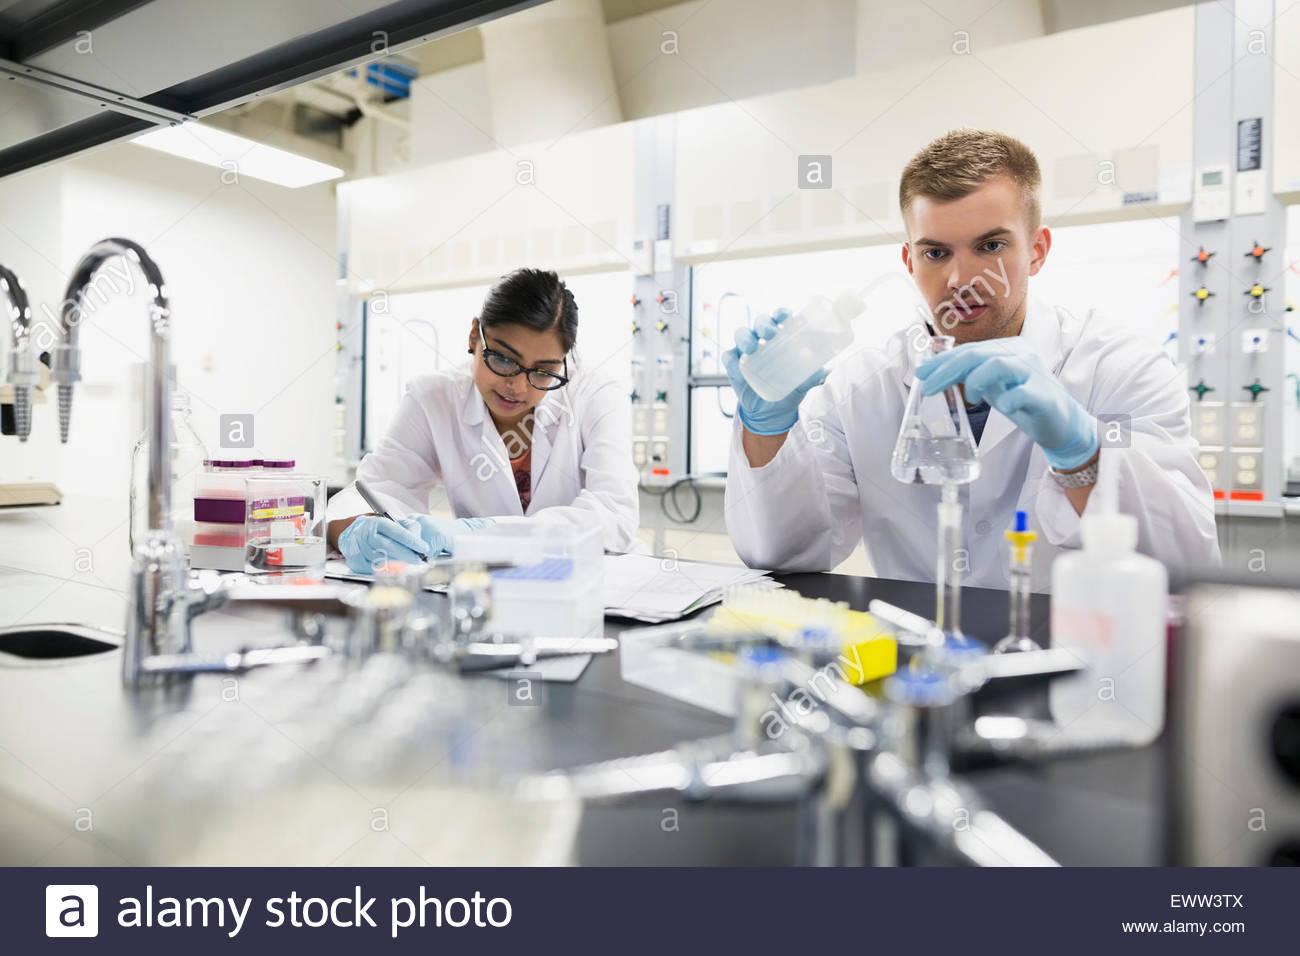 Scientists conducting scientific experiment in laboratory - Stock Image